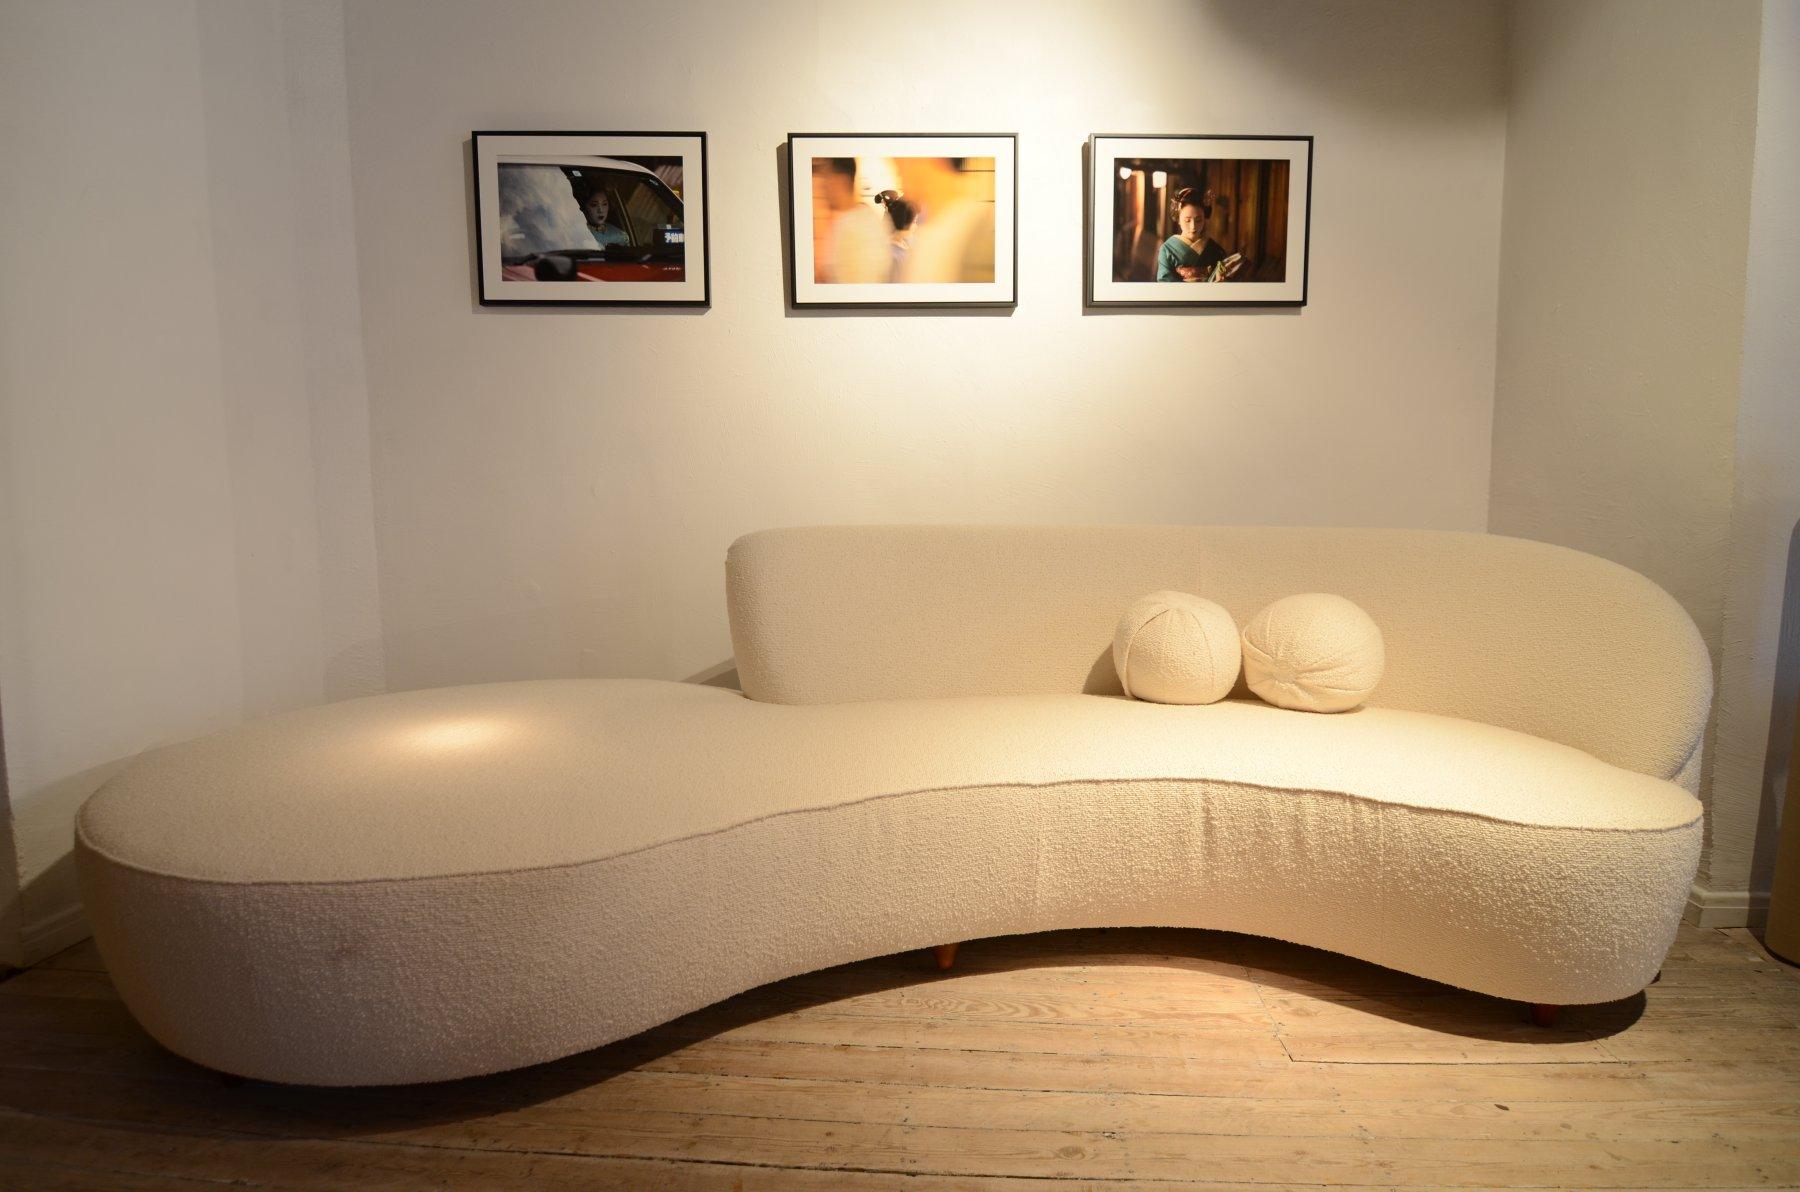 Sofa in the style of Vladimir Kagan